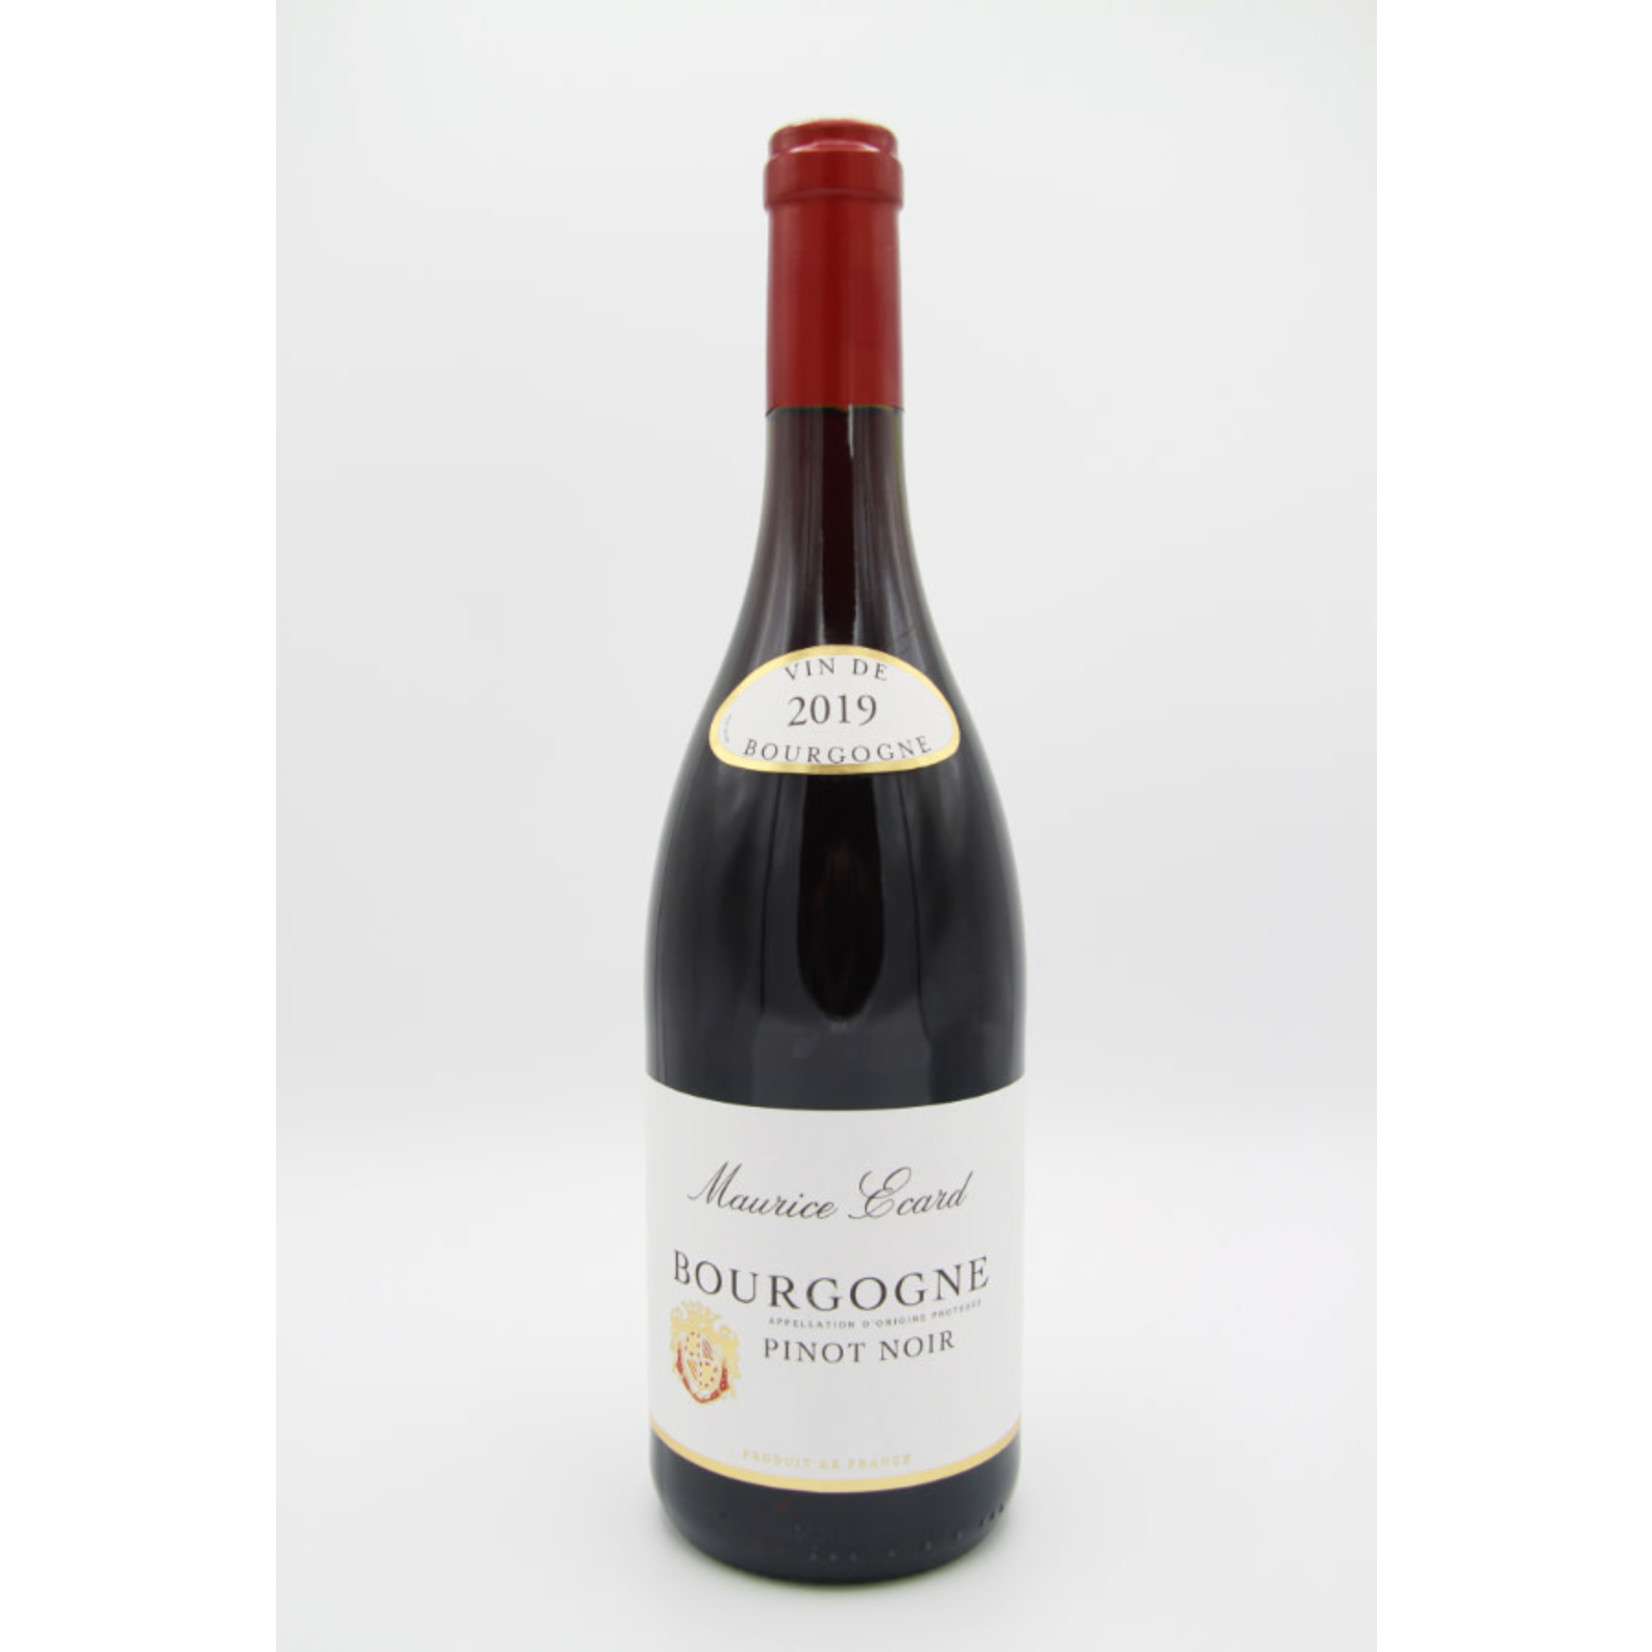 2019 Maurice Ecard Bourgogne Pinot Noir